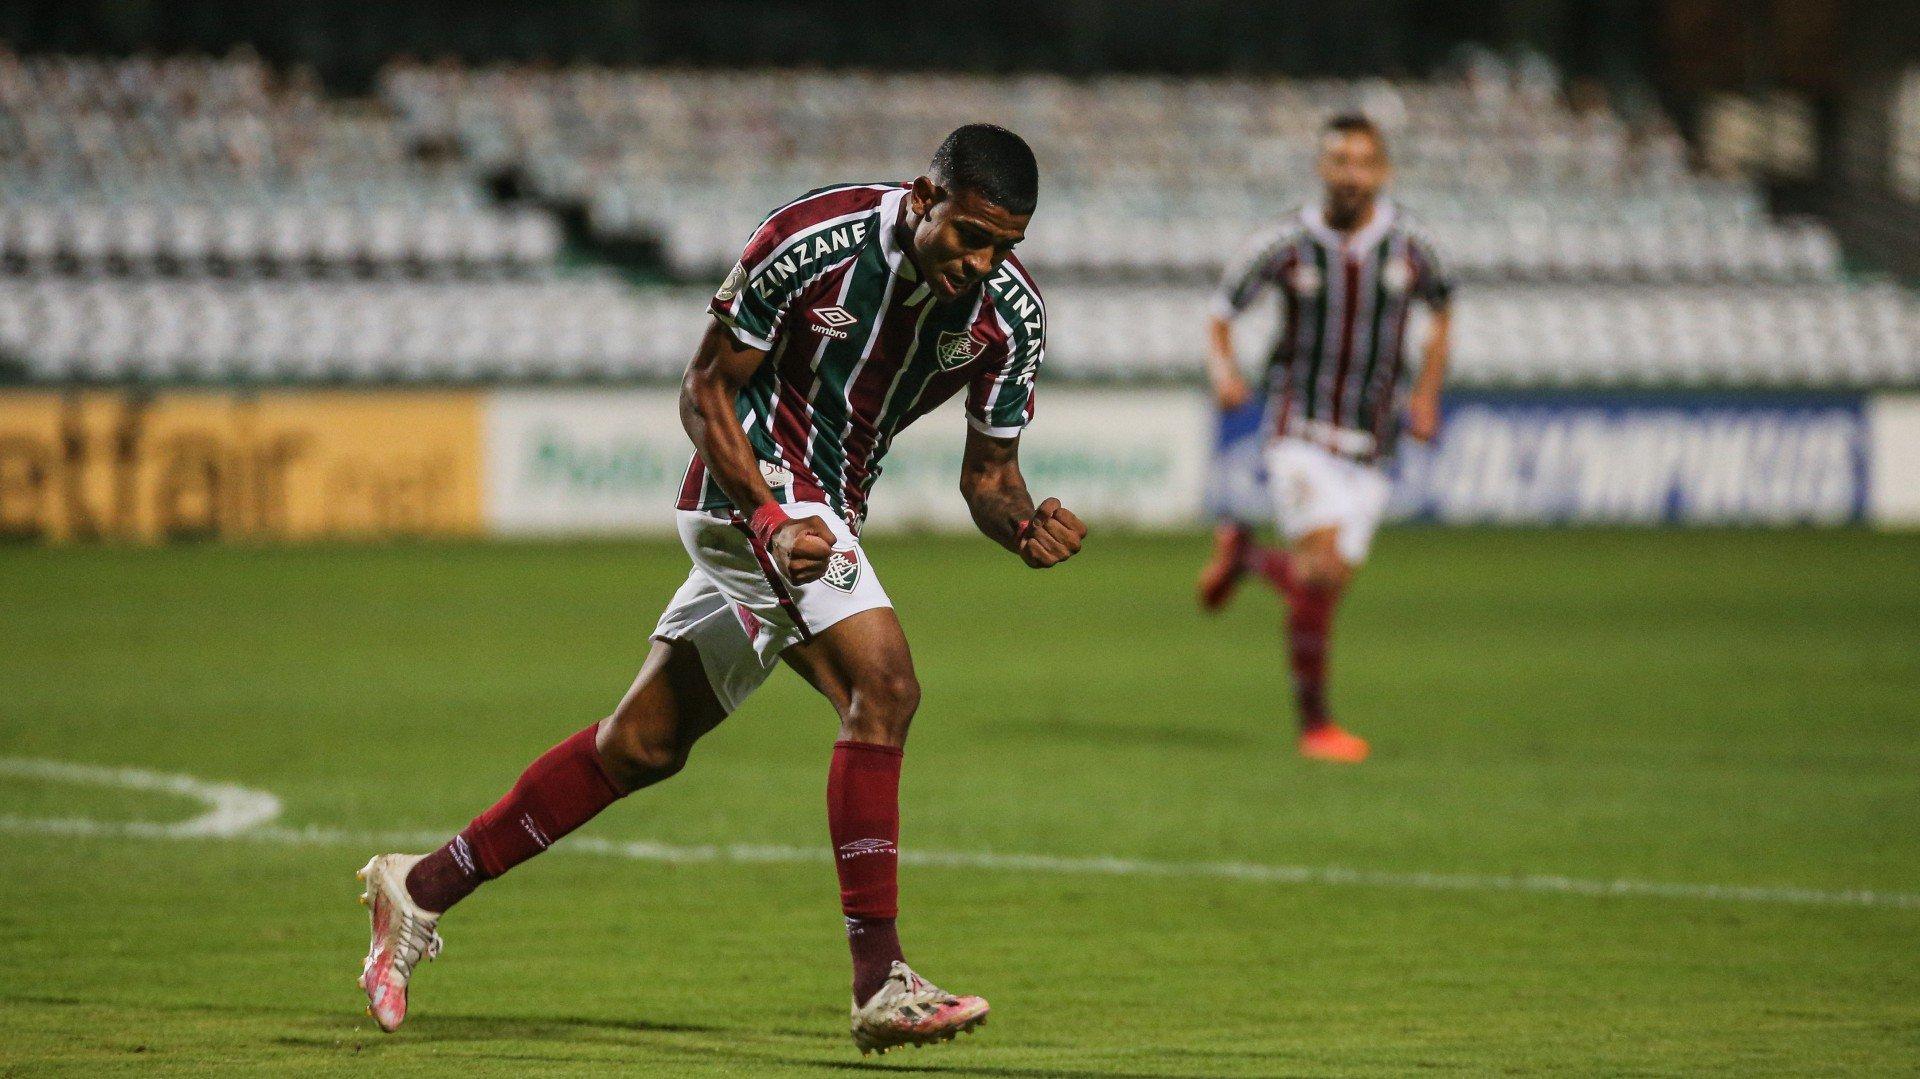 'Carrasco' do Flamengo na base, atacante do Fluminense pode iniciar primeiro Fla-Flu como titular no profissional